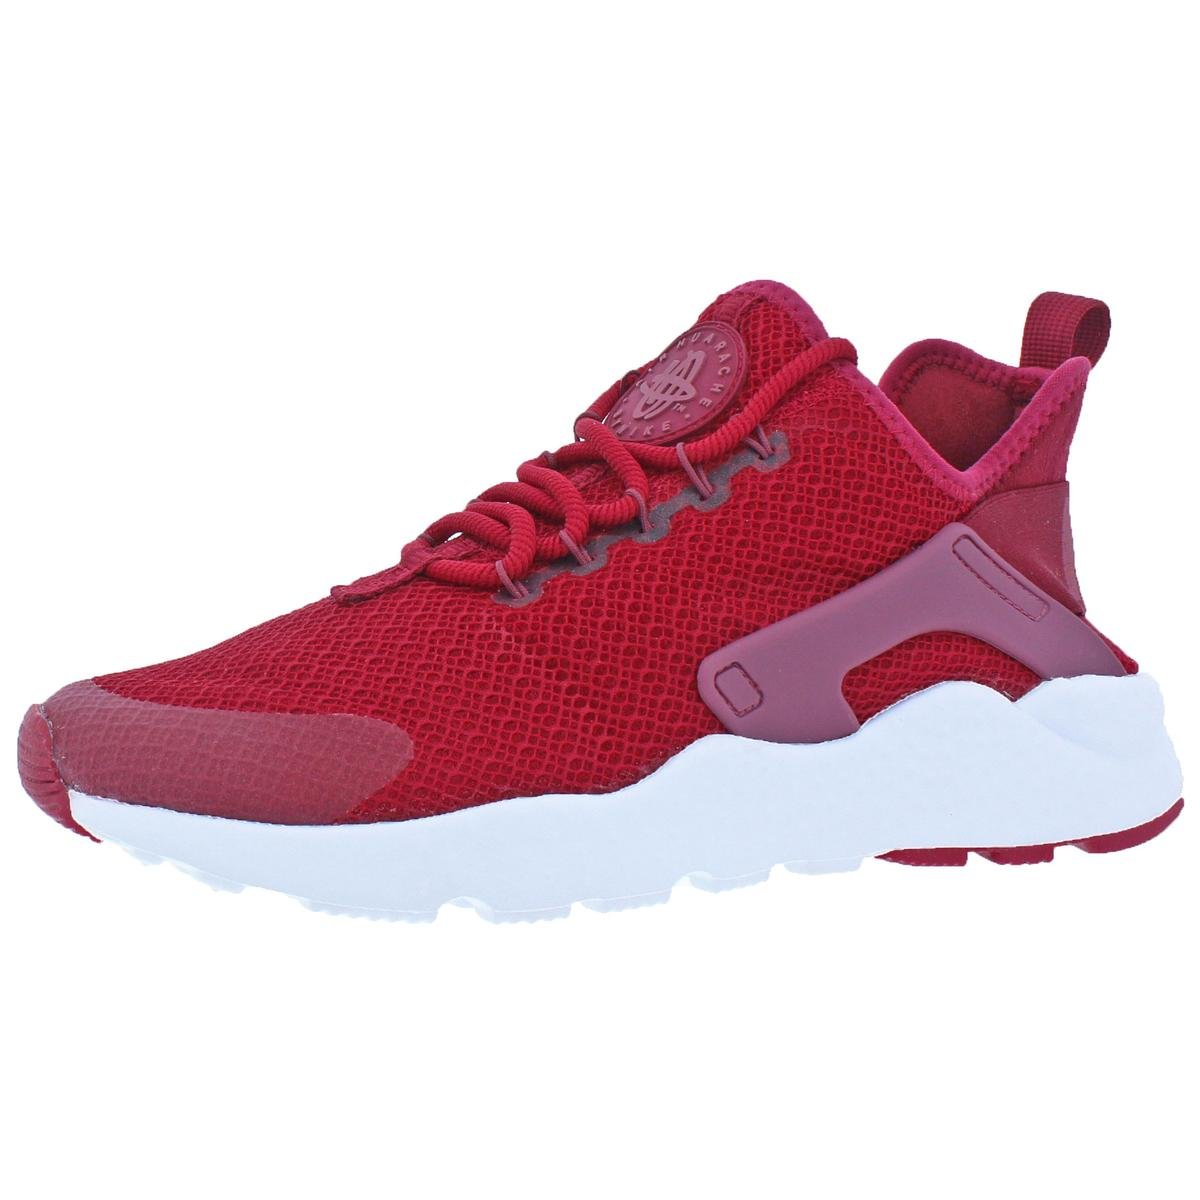 new arrivals bbe83 24c8e Galleon - NIKE Womens Air Huarache Run Ultra Training Running Shoes Red 8.5  Medium (B,M)